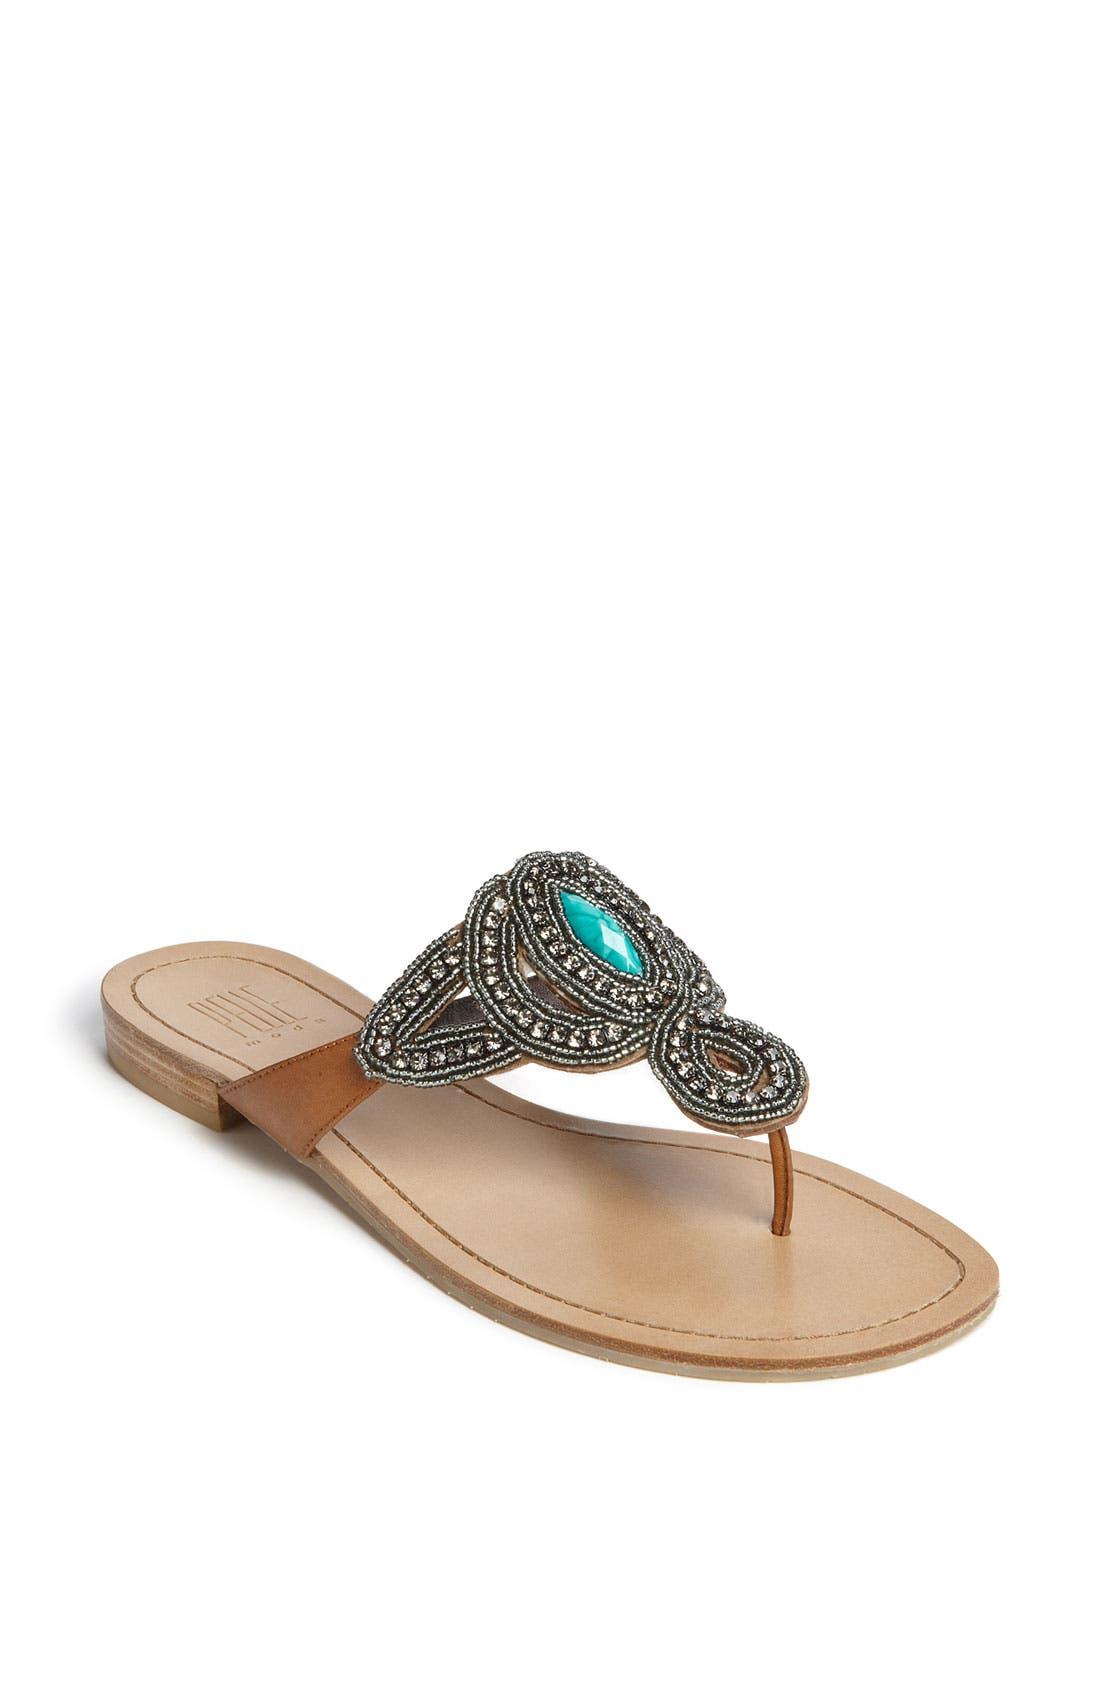 Alternate Image 1 Selected - Pelle Moda 'Banta' Sandal